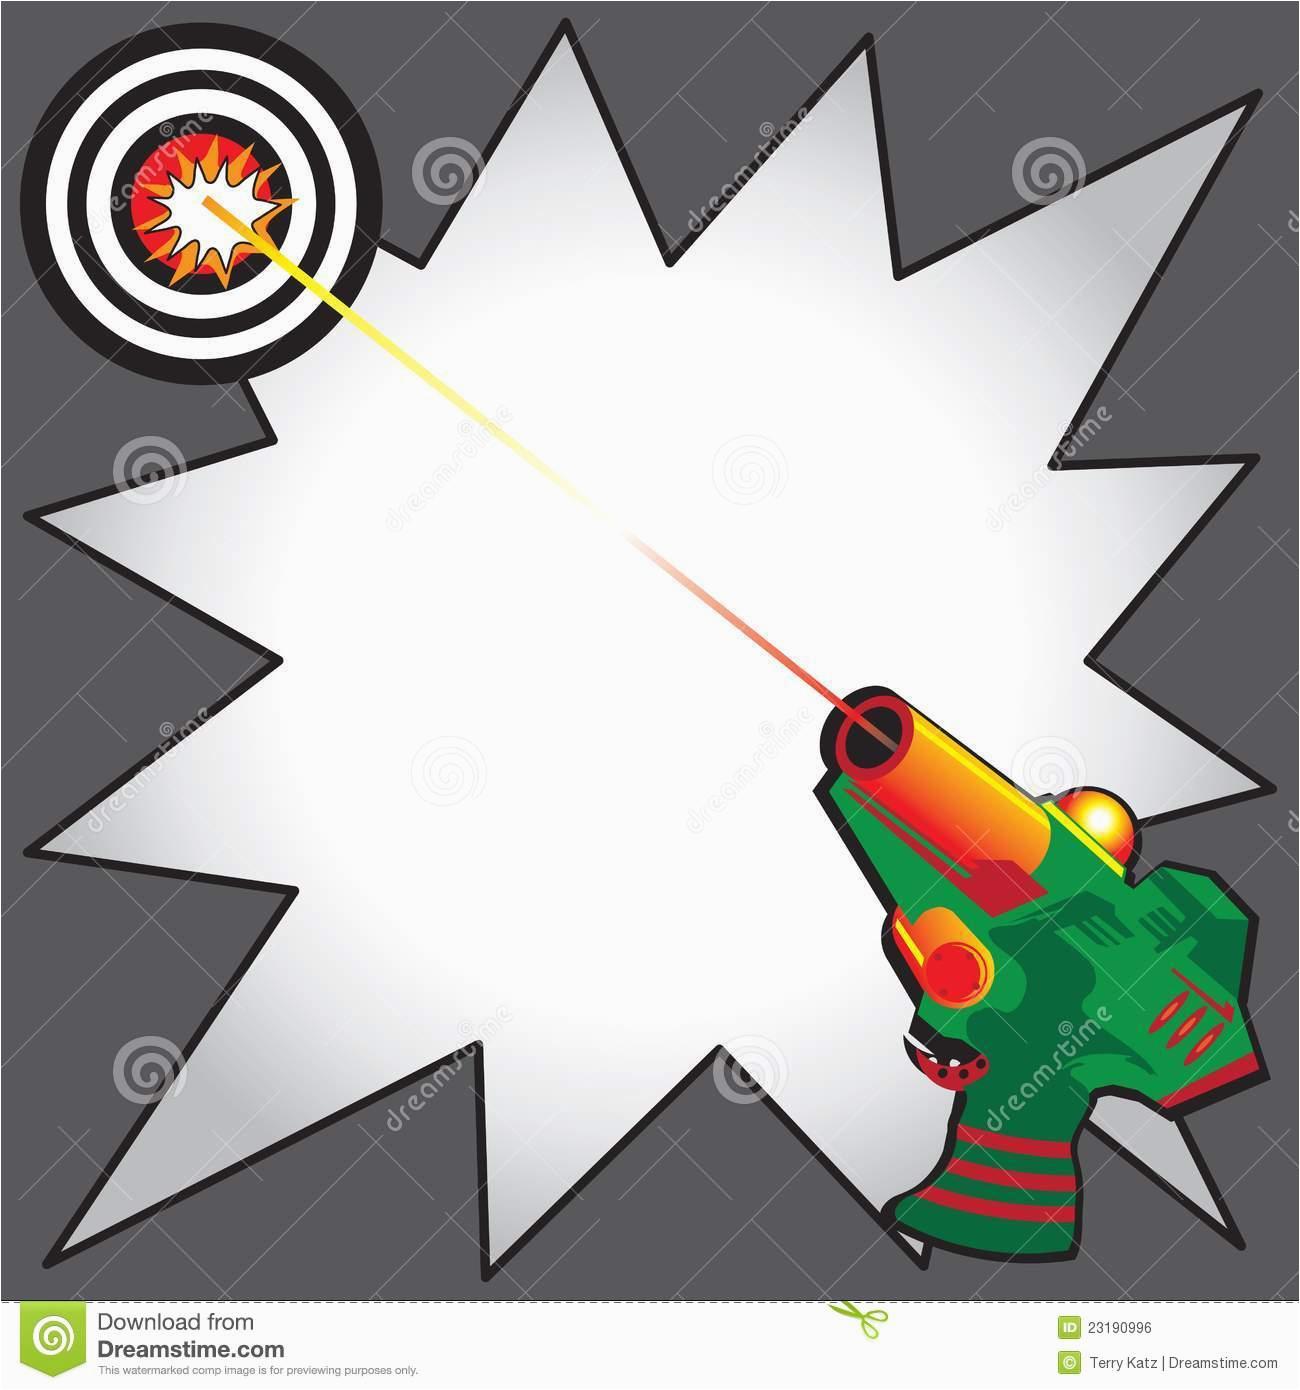 Laser Tag Birthday Invitation Templates Free Laser Tag Party Invitations Template Free Cimvitation